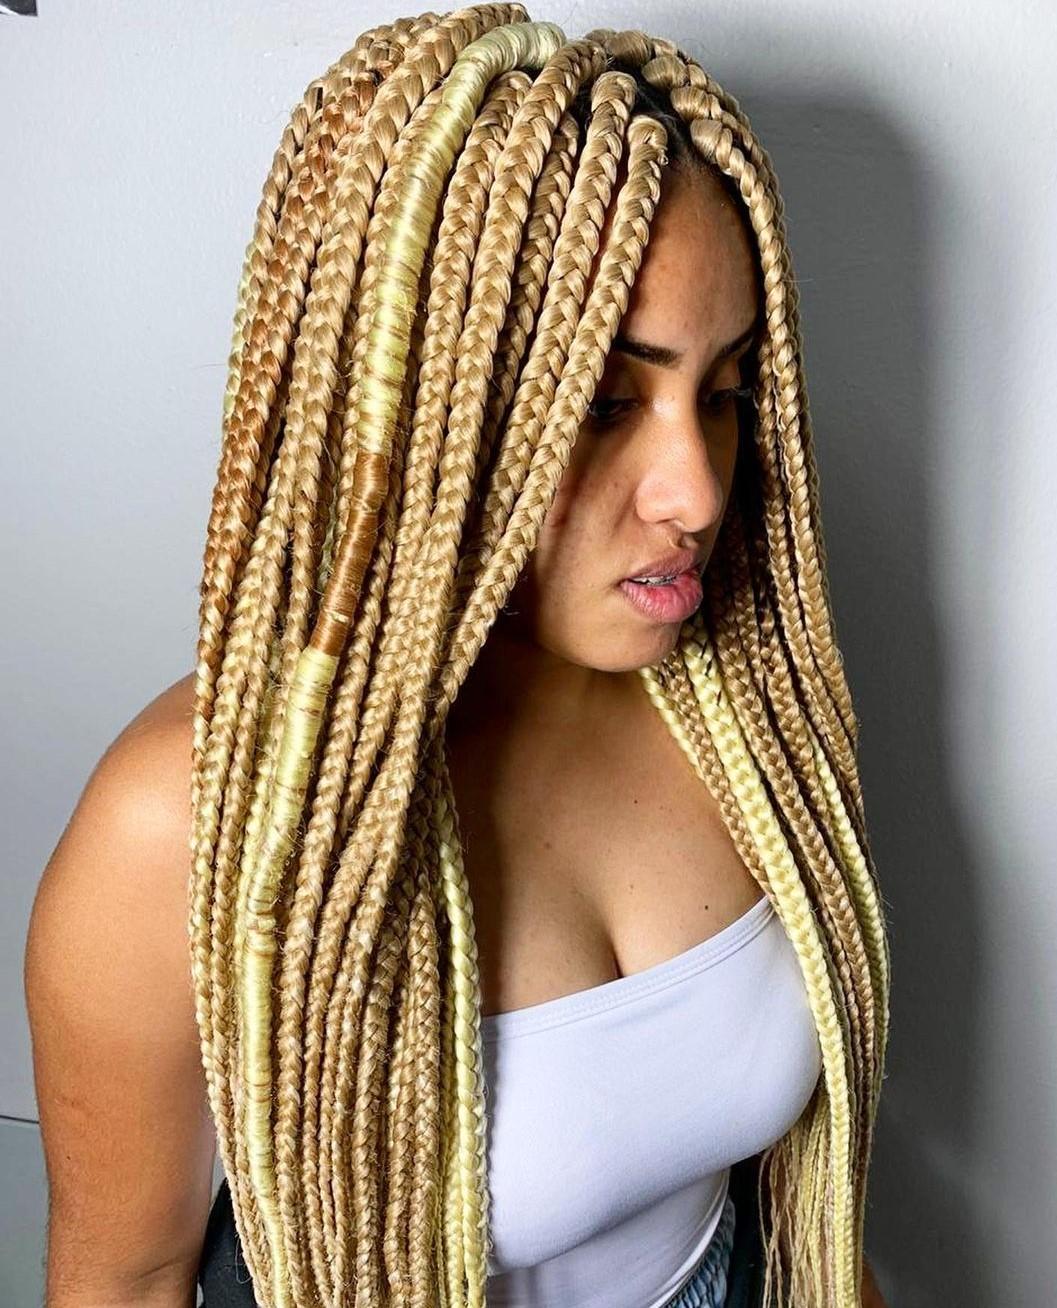 Waist-Length Box Braids in Honey Blonde